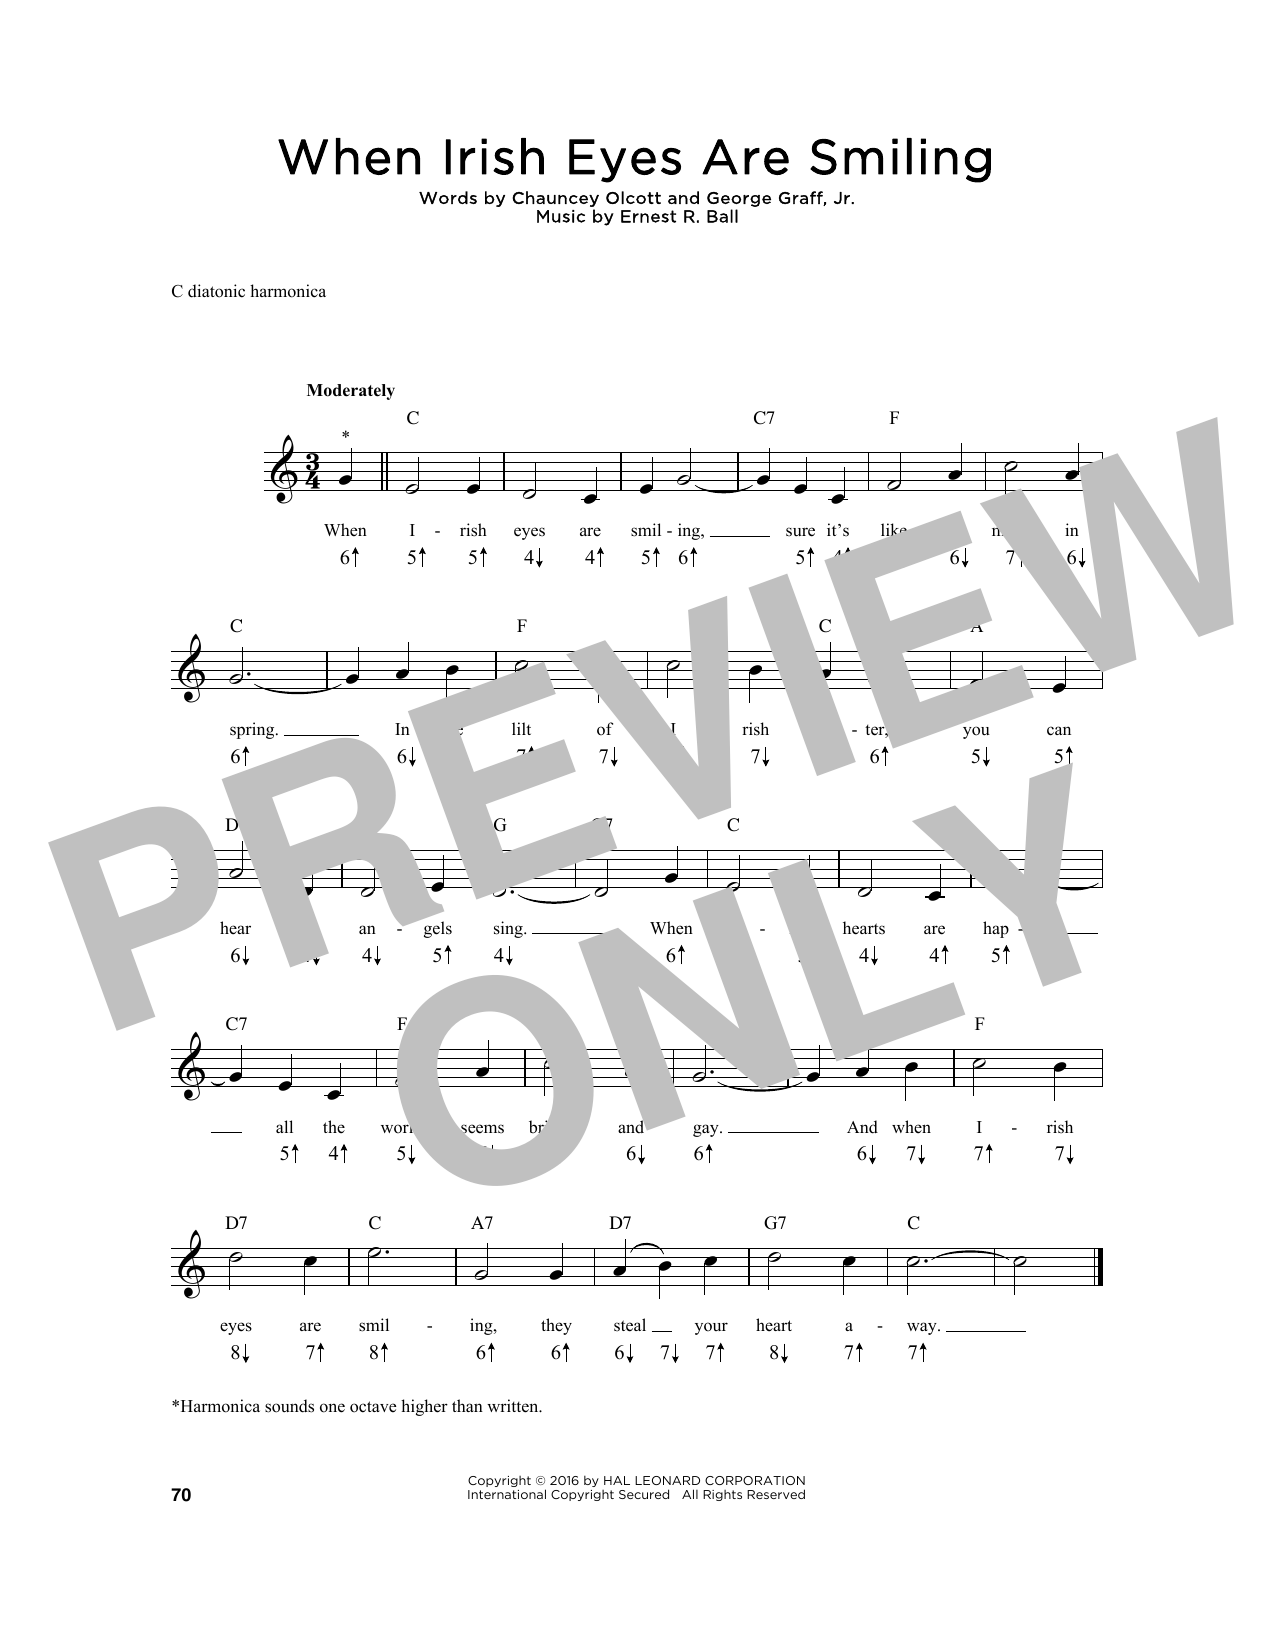 Sheet Music Digital Files To Print Licensed Chauncey Olcott